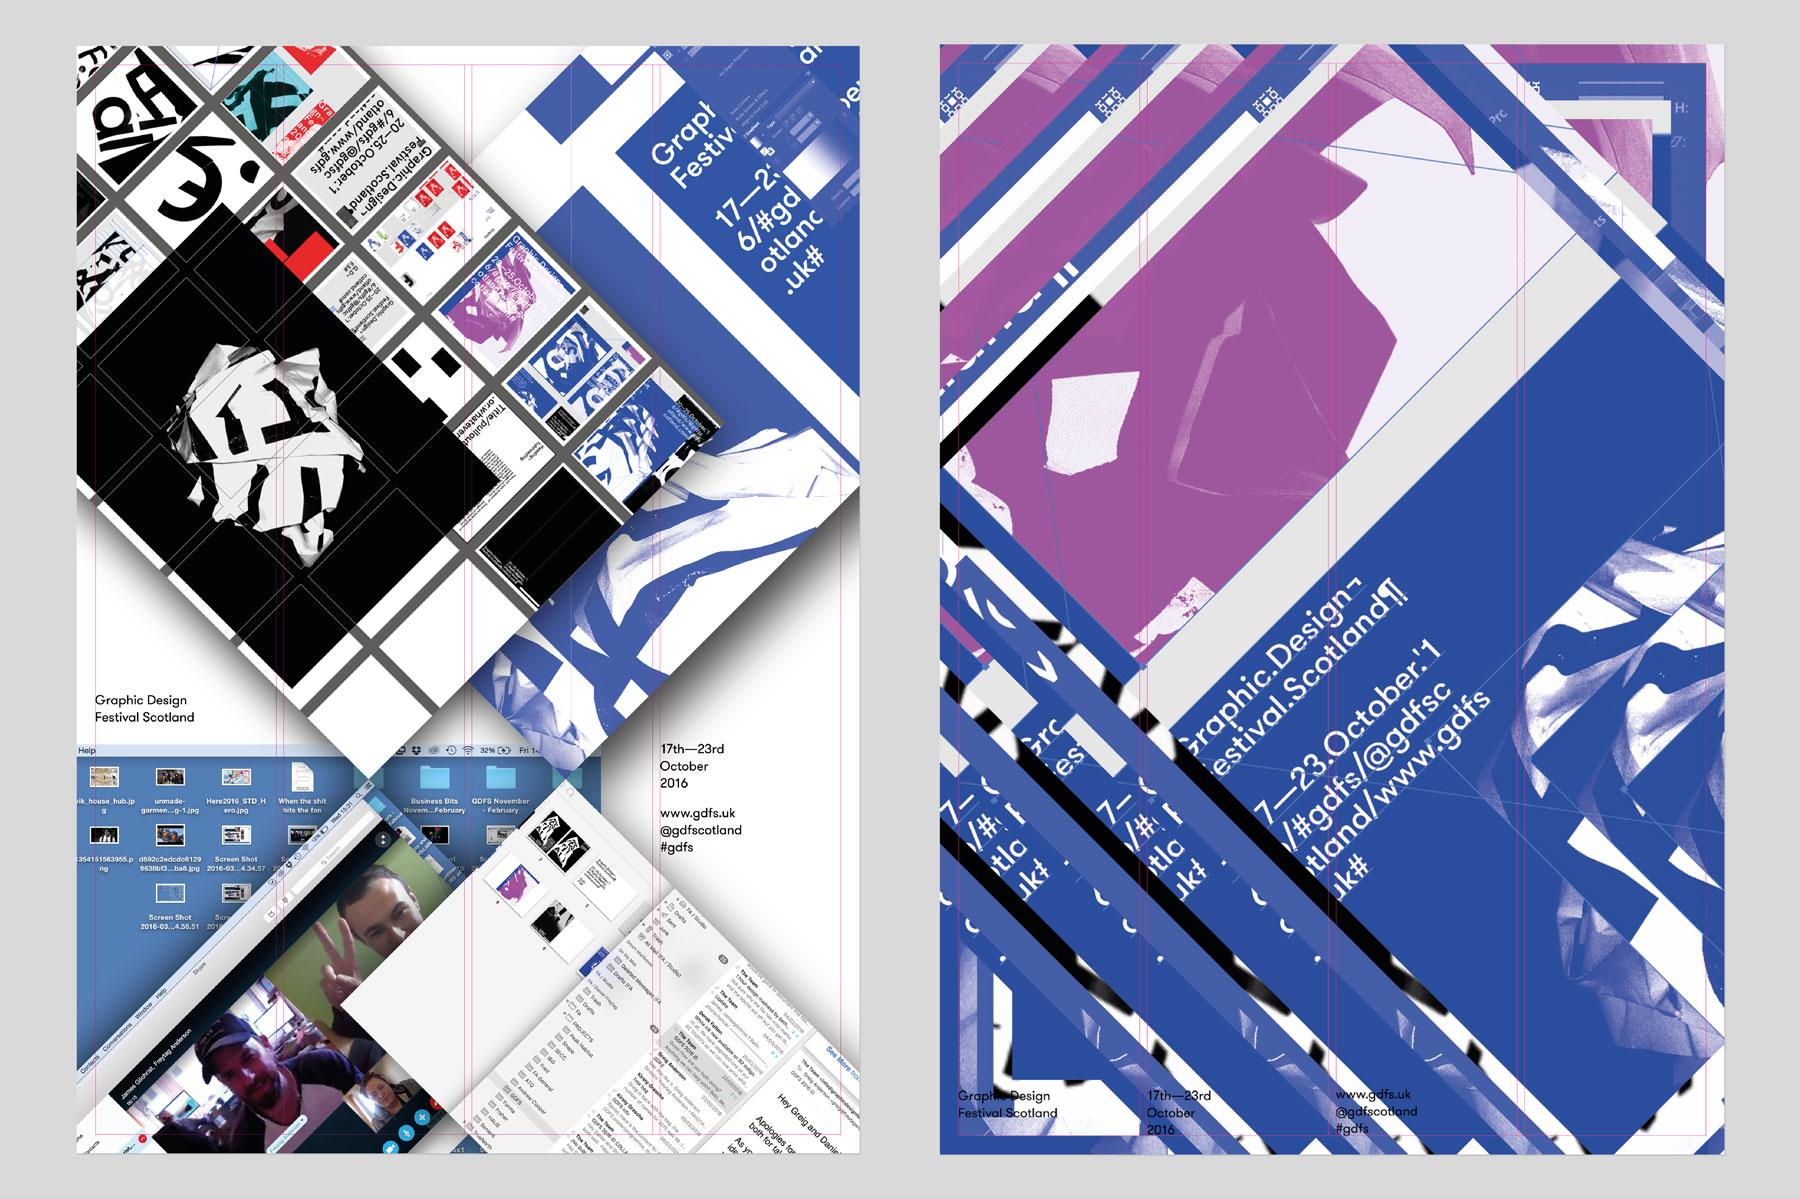 15gdfs-16-custom-identity-posters